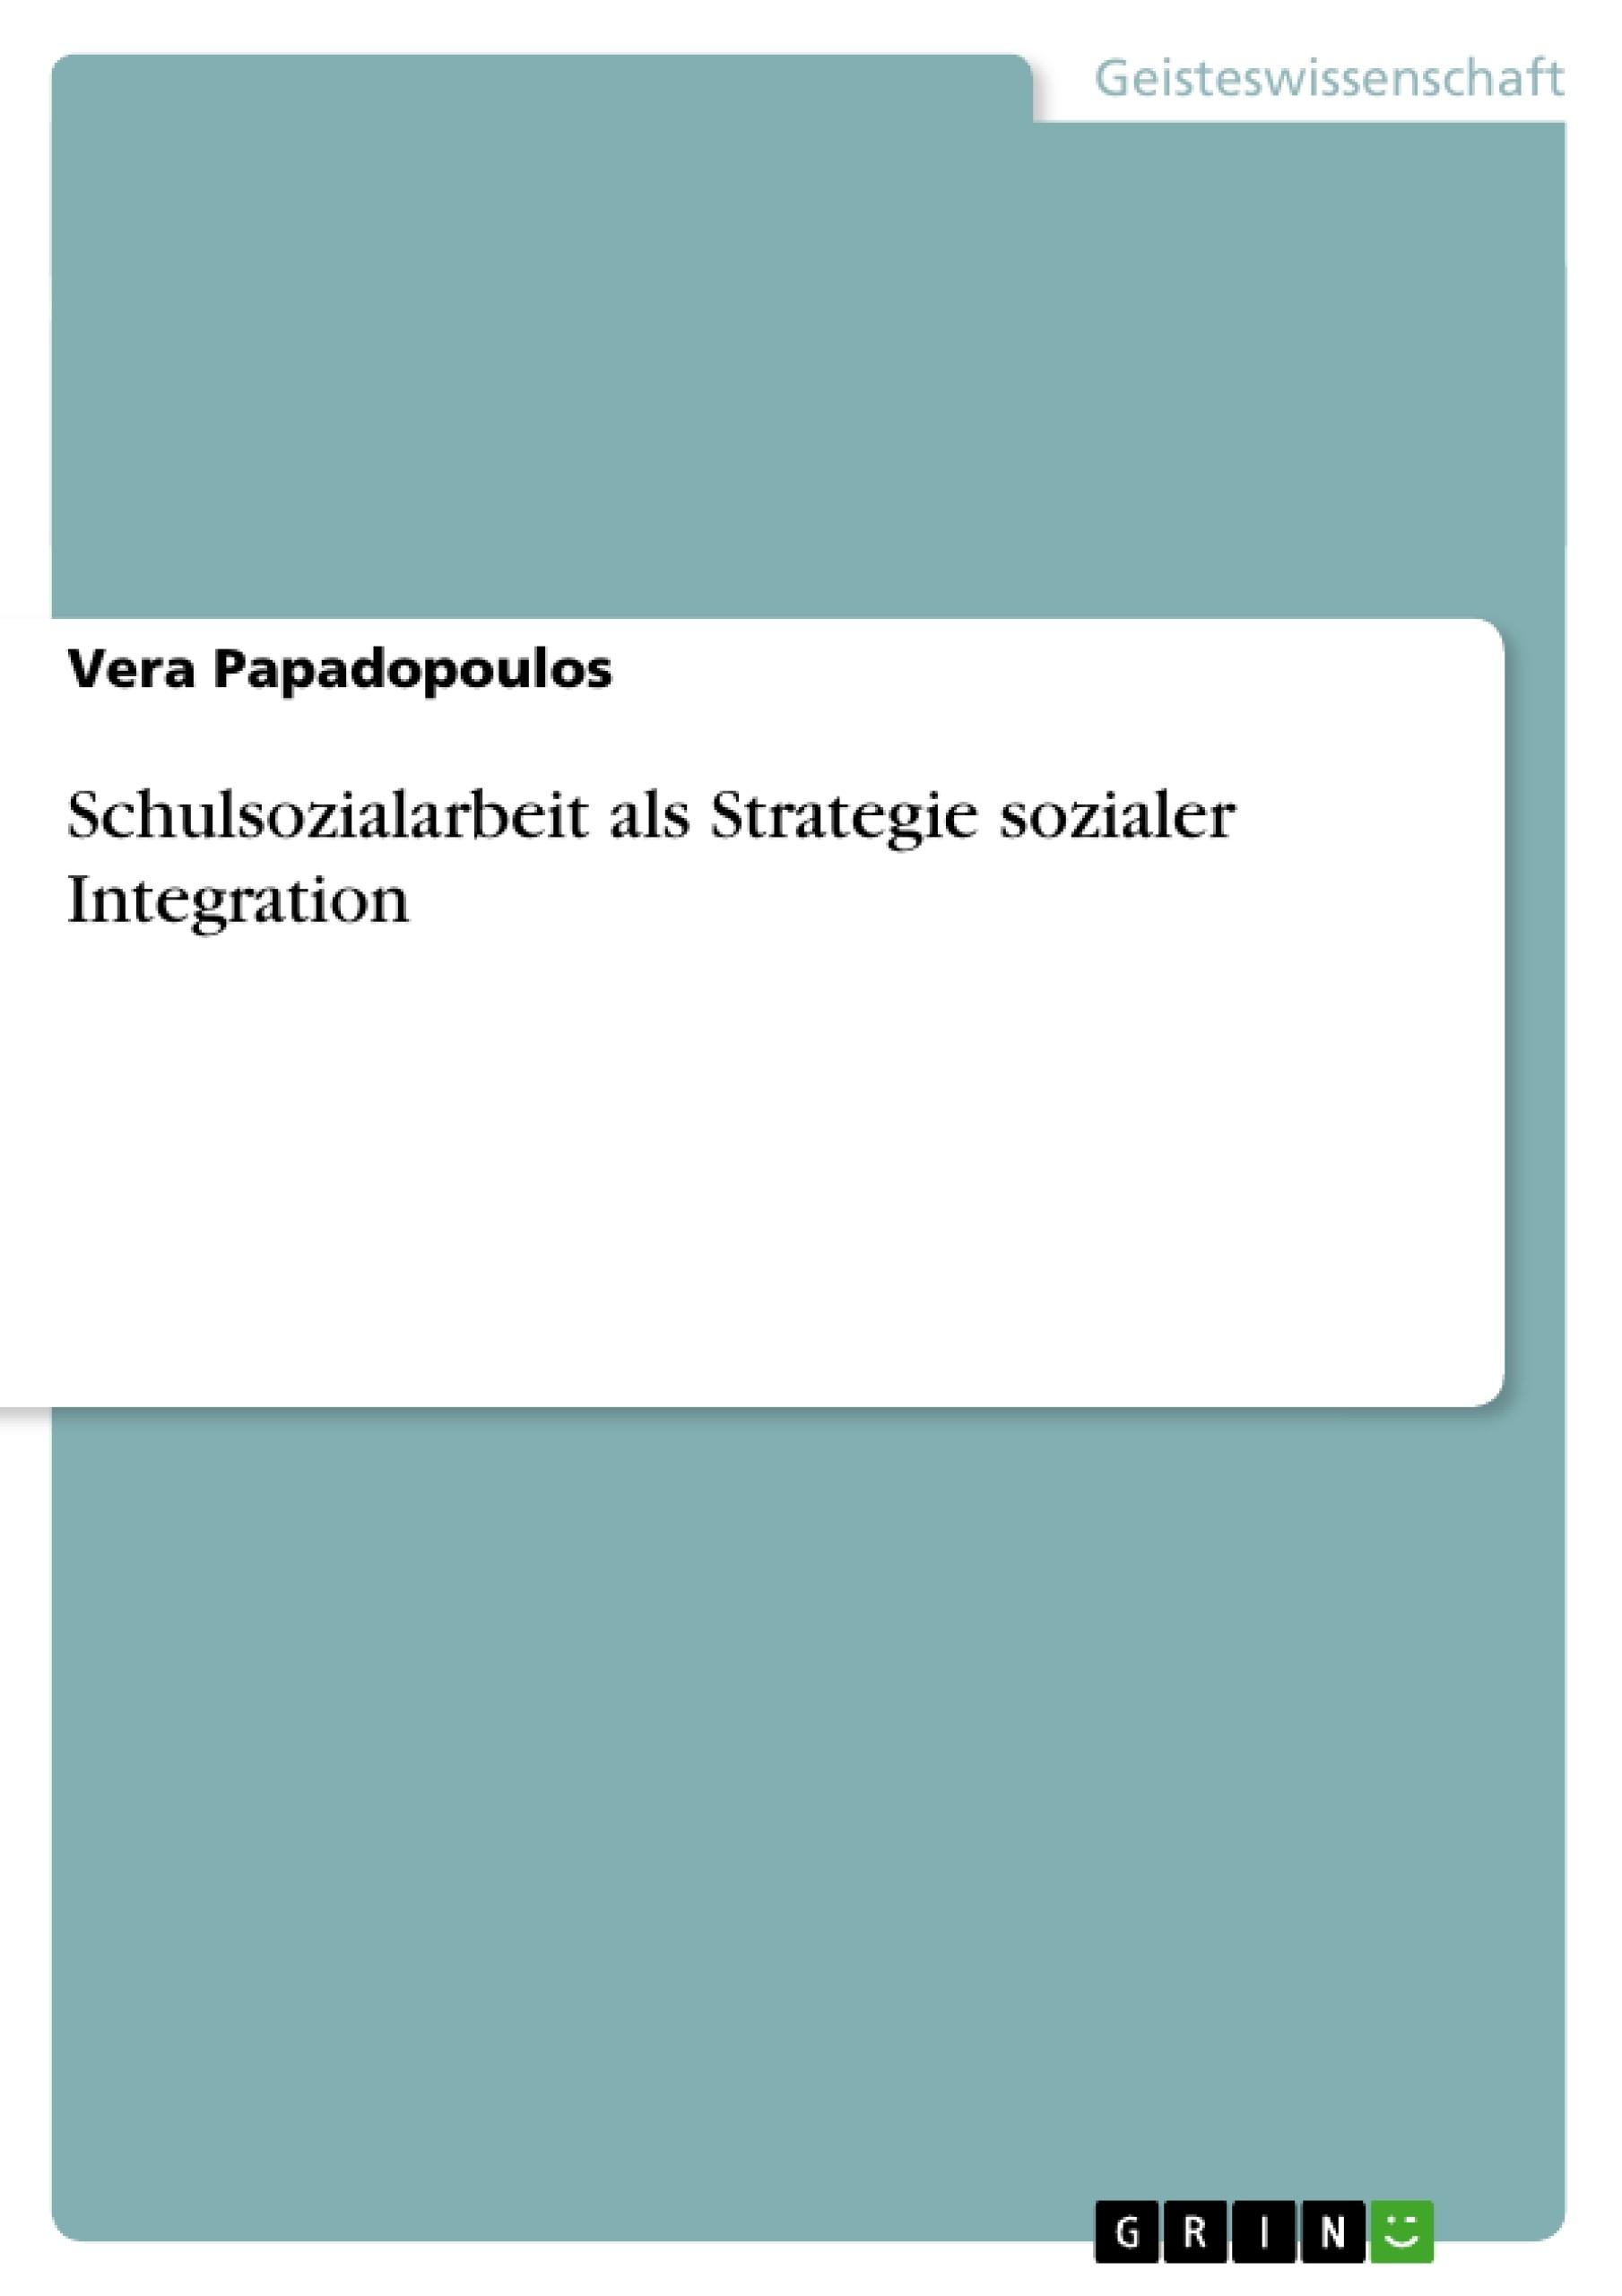 Titel: Schulsozialarbeit als Strategie sozialer Integration